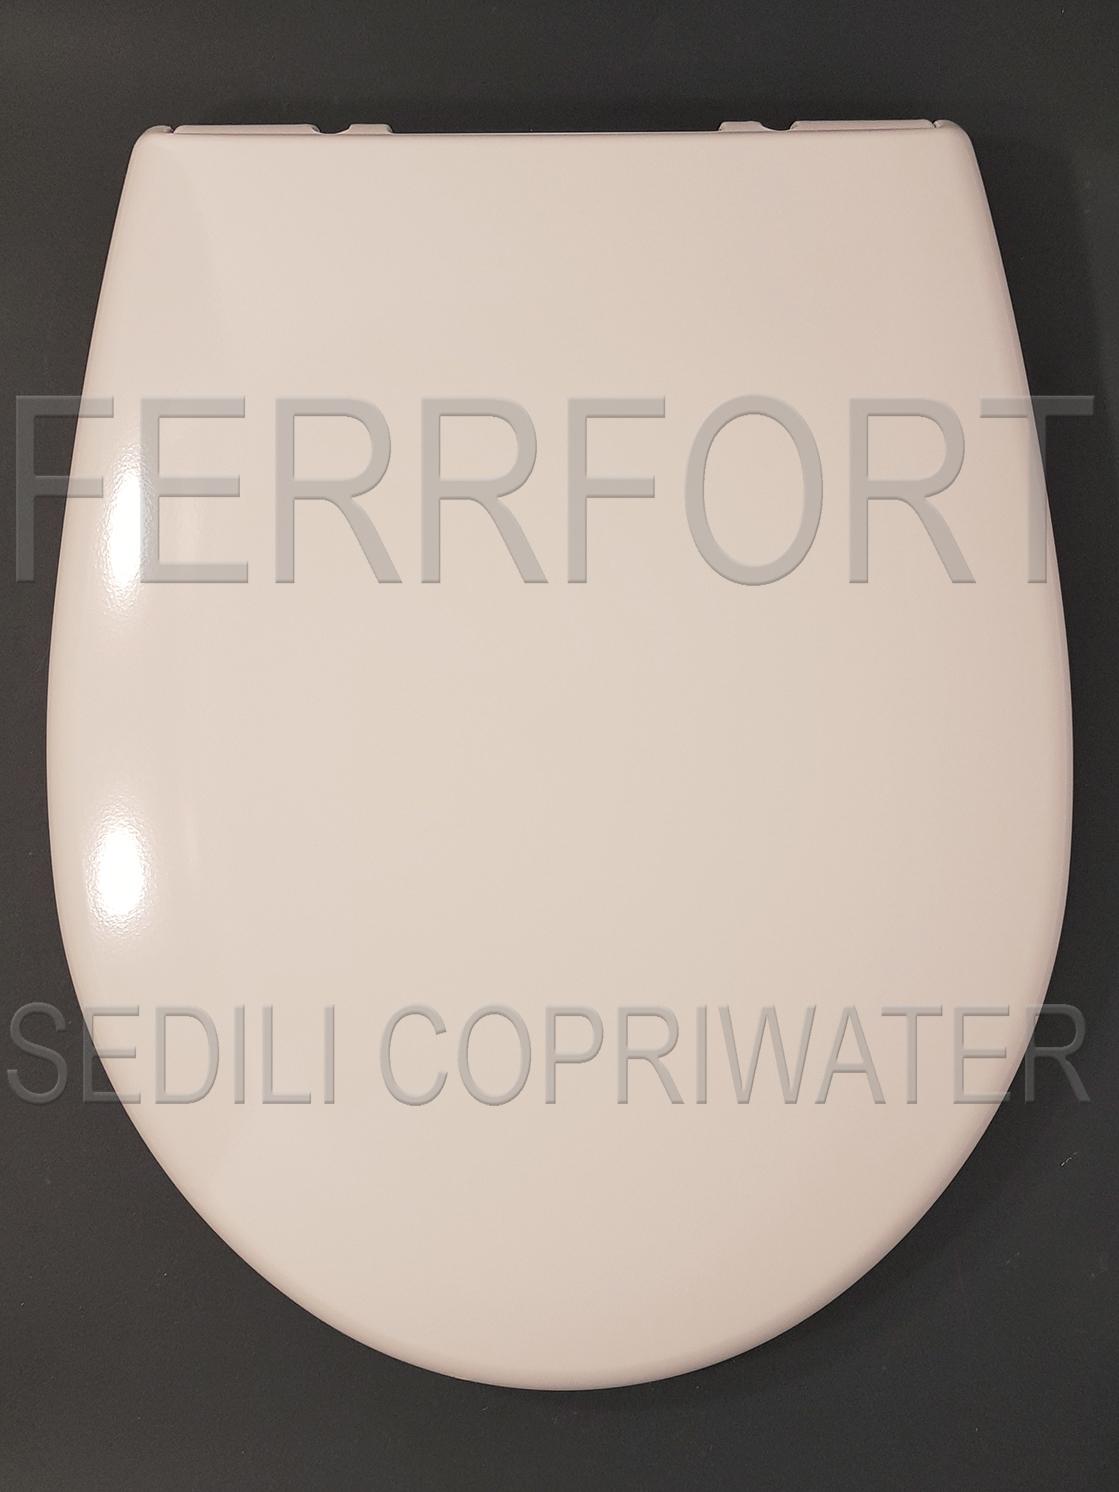 SEDILE COPRIWATER TERMOINDURENTE DUROPLAST BOWL 52/55 GLOBO BIANCO